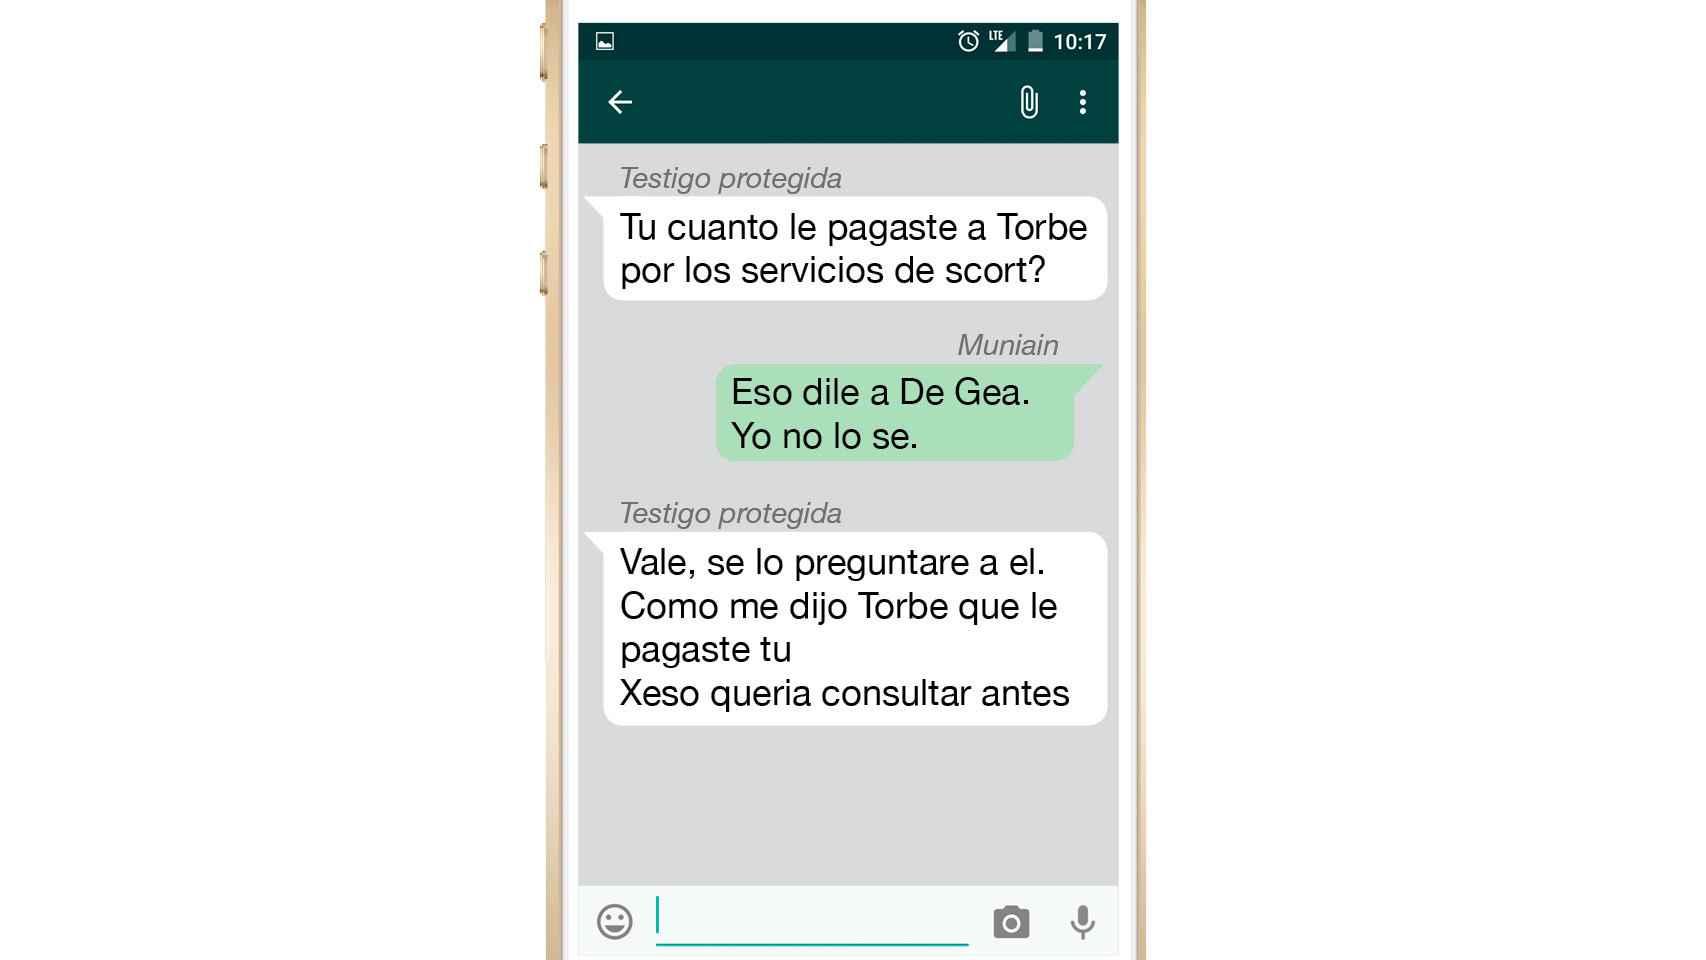 Imagen del Whatsapp con la testigo protegida